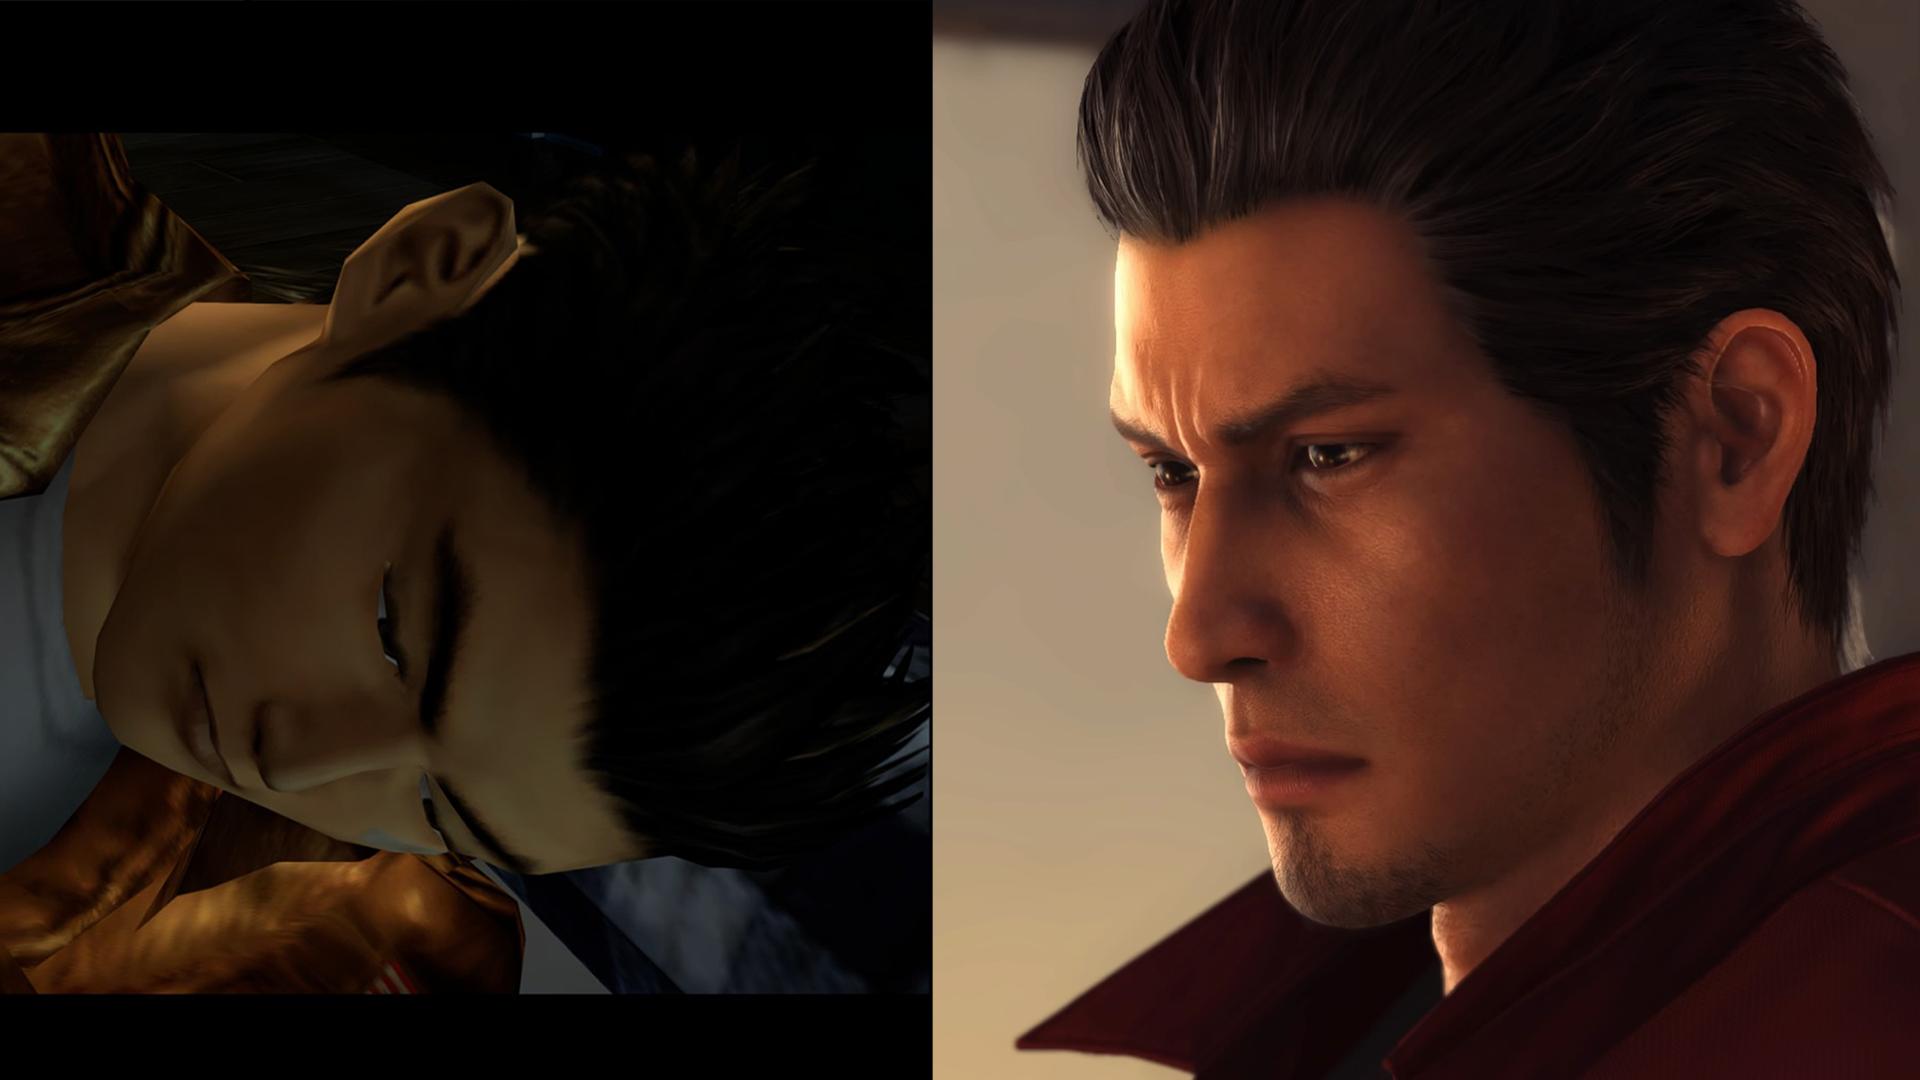 Shenmue and Yakuza are really not that similar screenshot